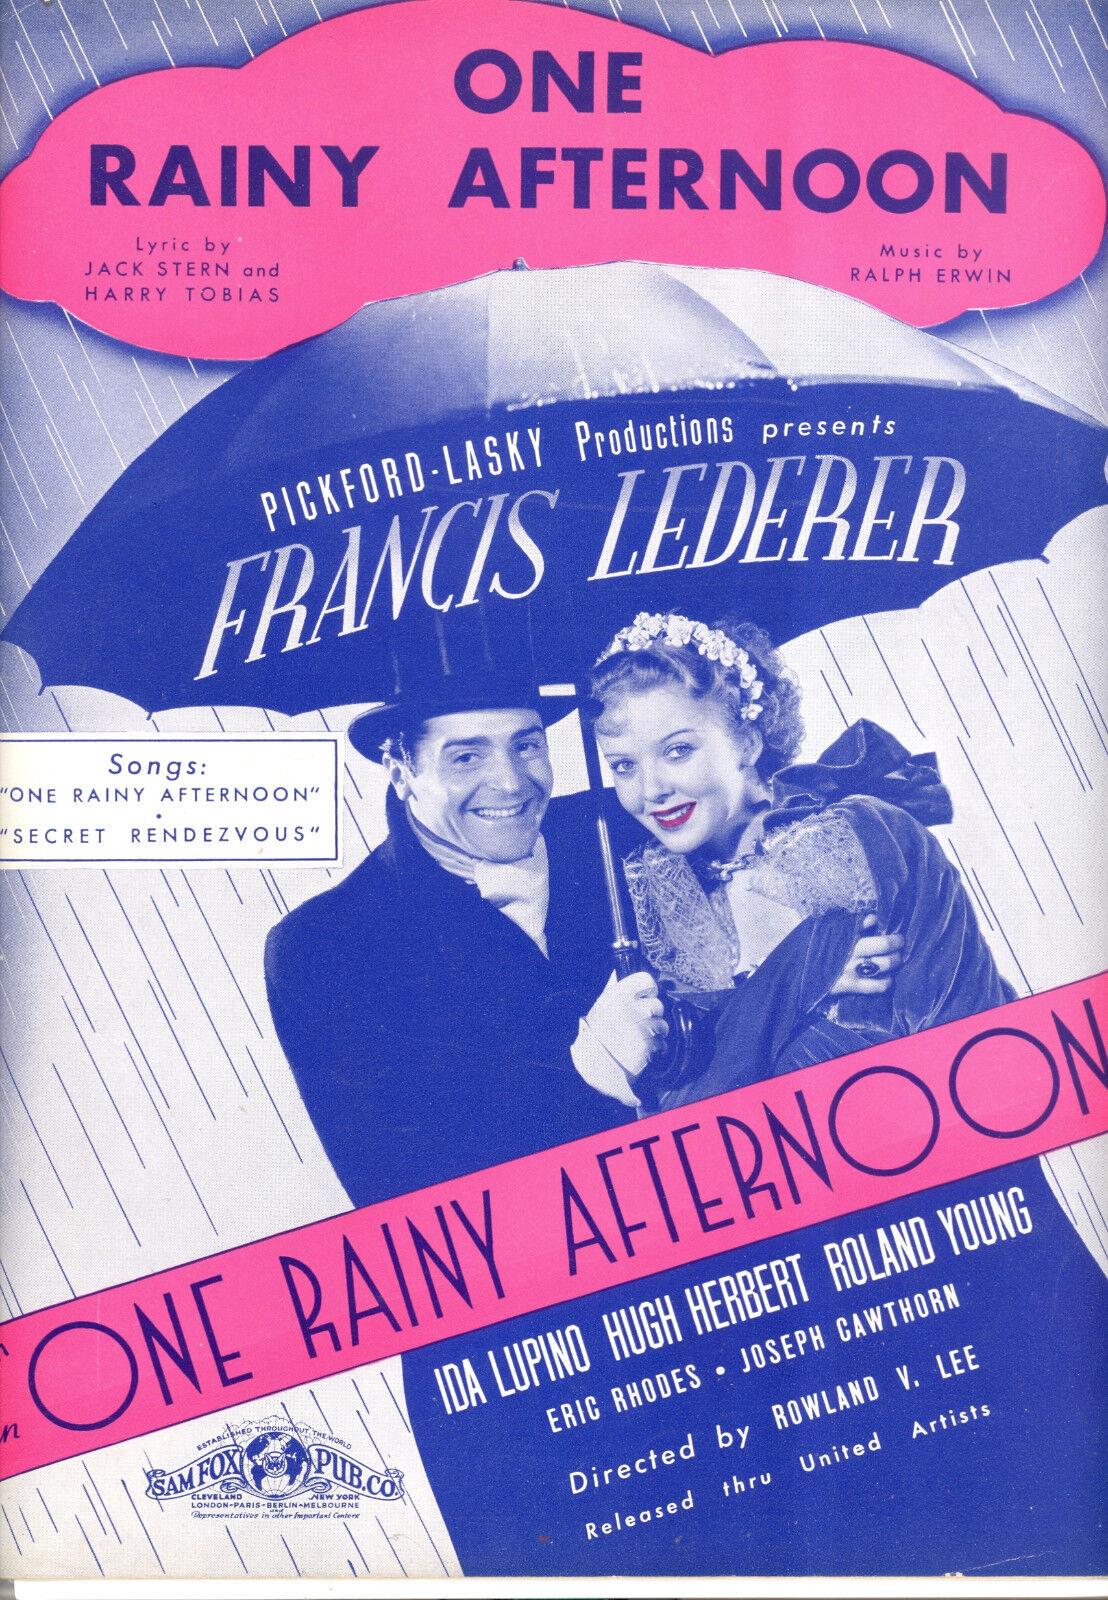 Eine Rainy Afternoon Notenblatt     Ida Lupino Francis Lederer